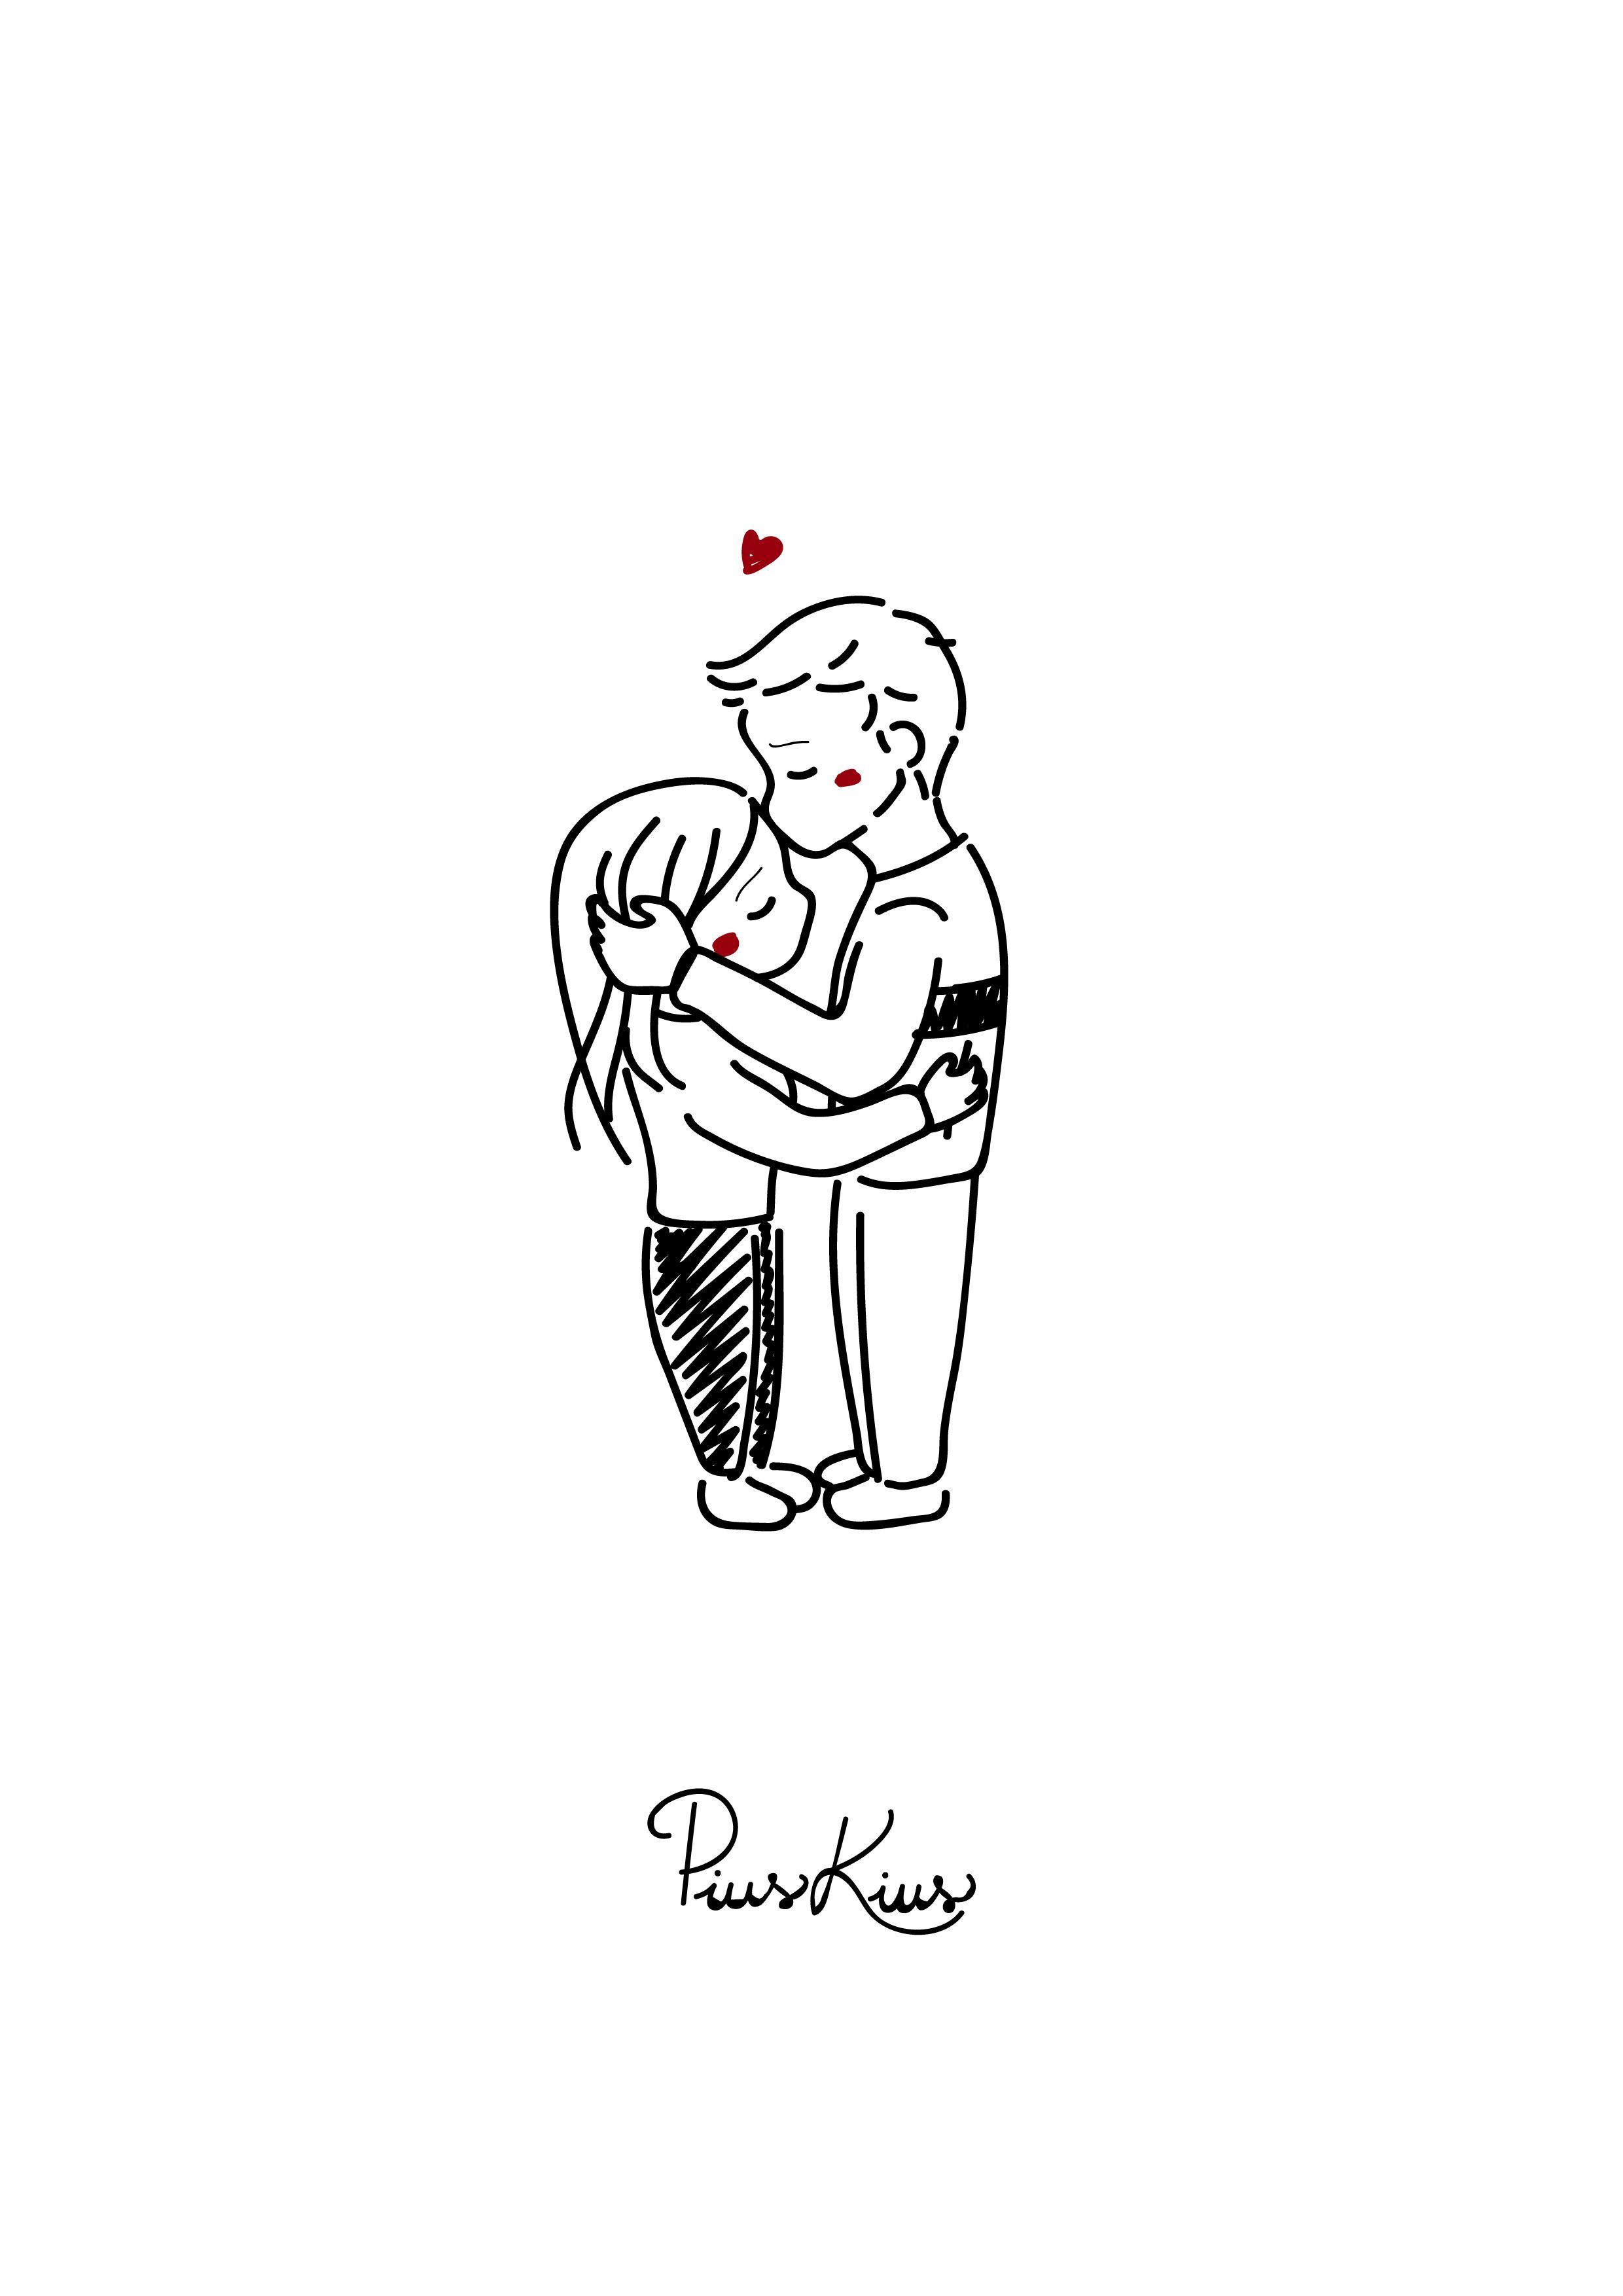 Front Kiss Dibujos De Abrazos Dibujos Animados De Pareja Bocetos Bonitos De Parejas